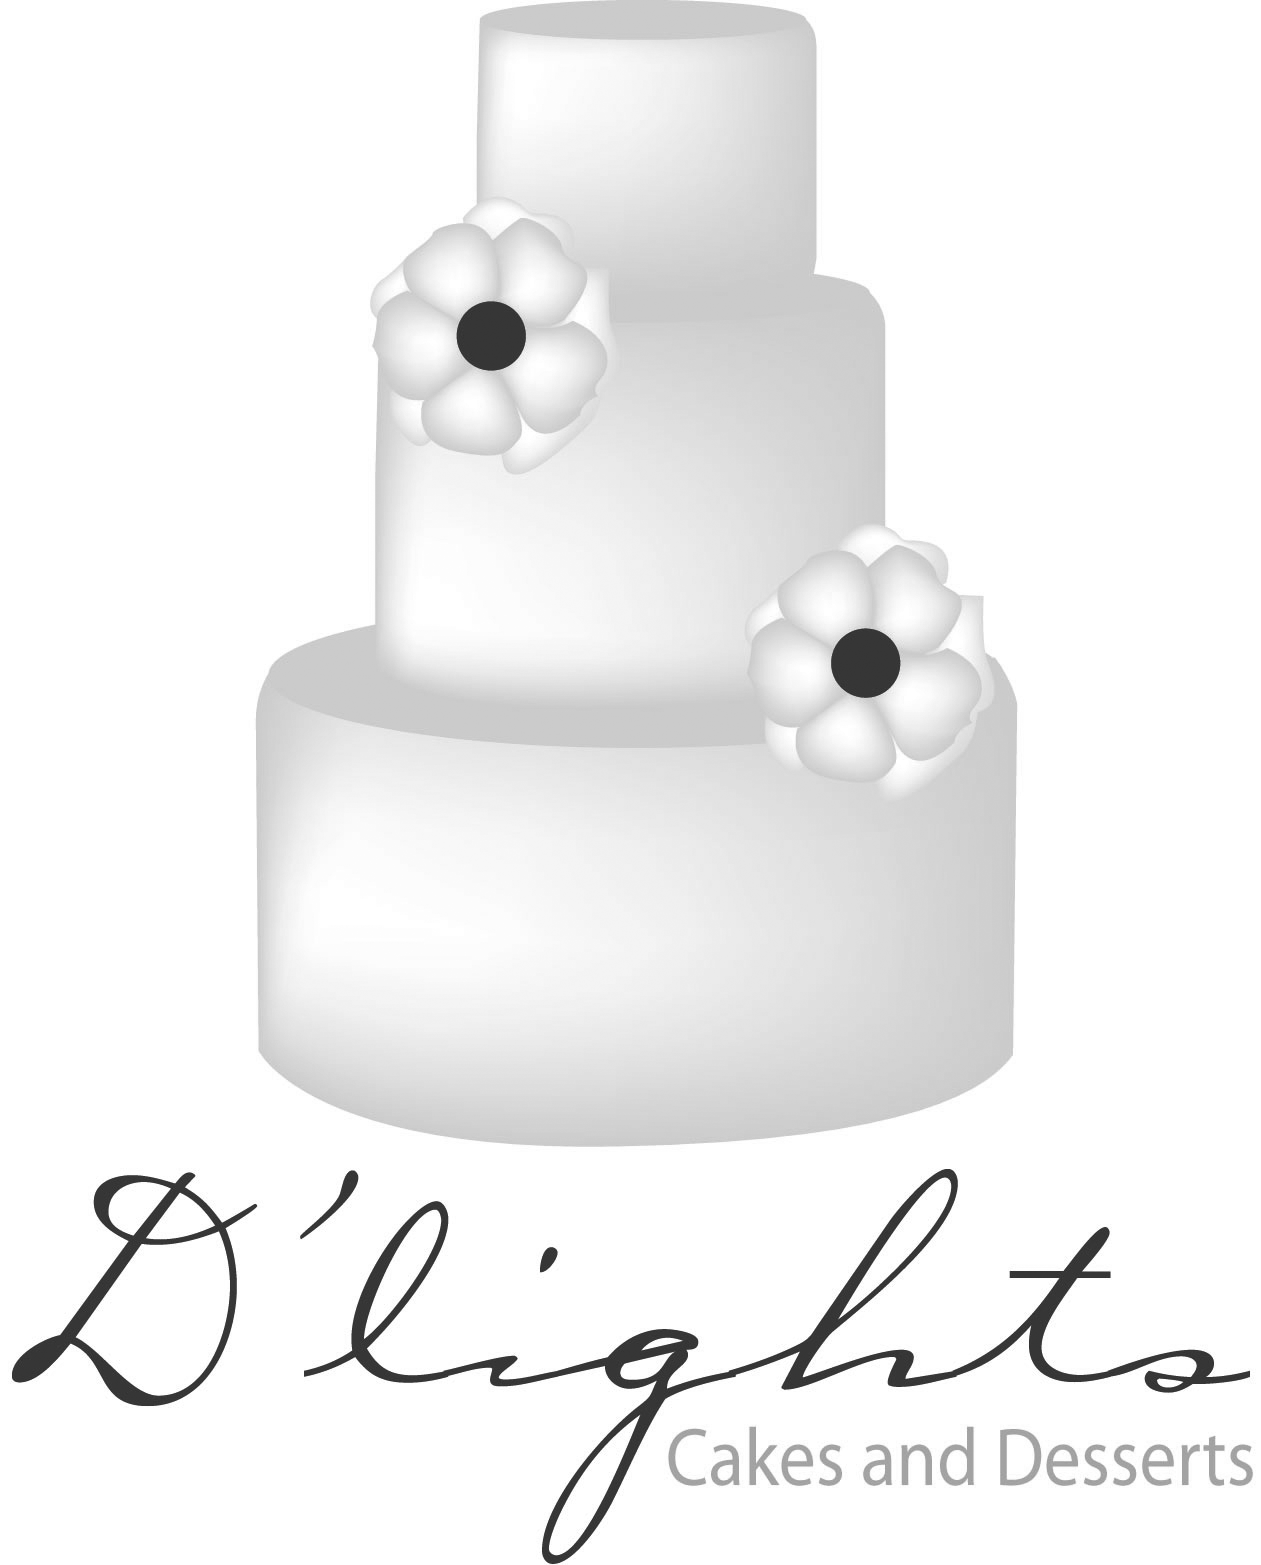 D'Lights Cakes & Desserts